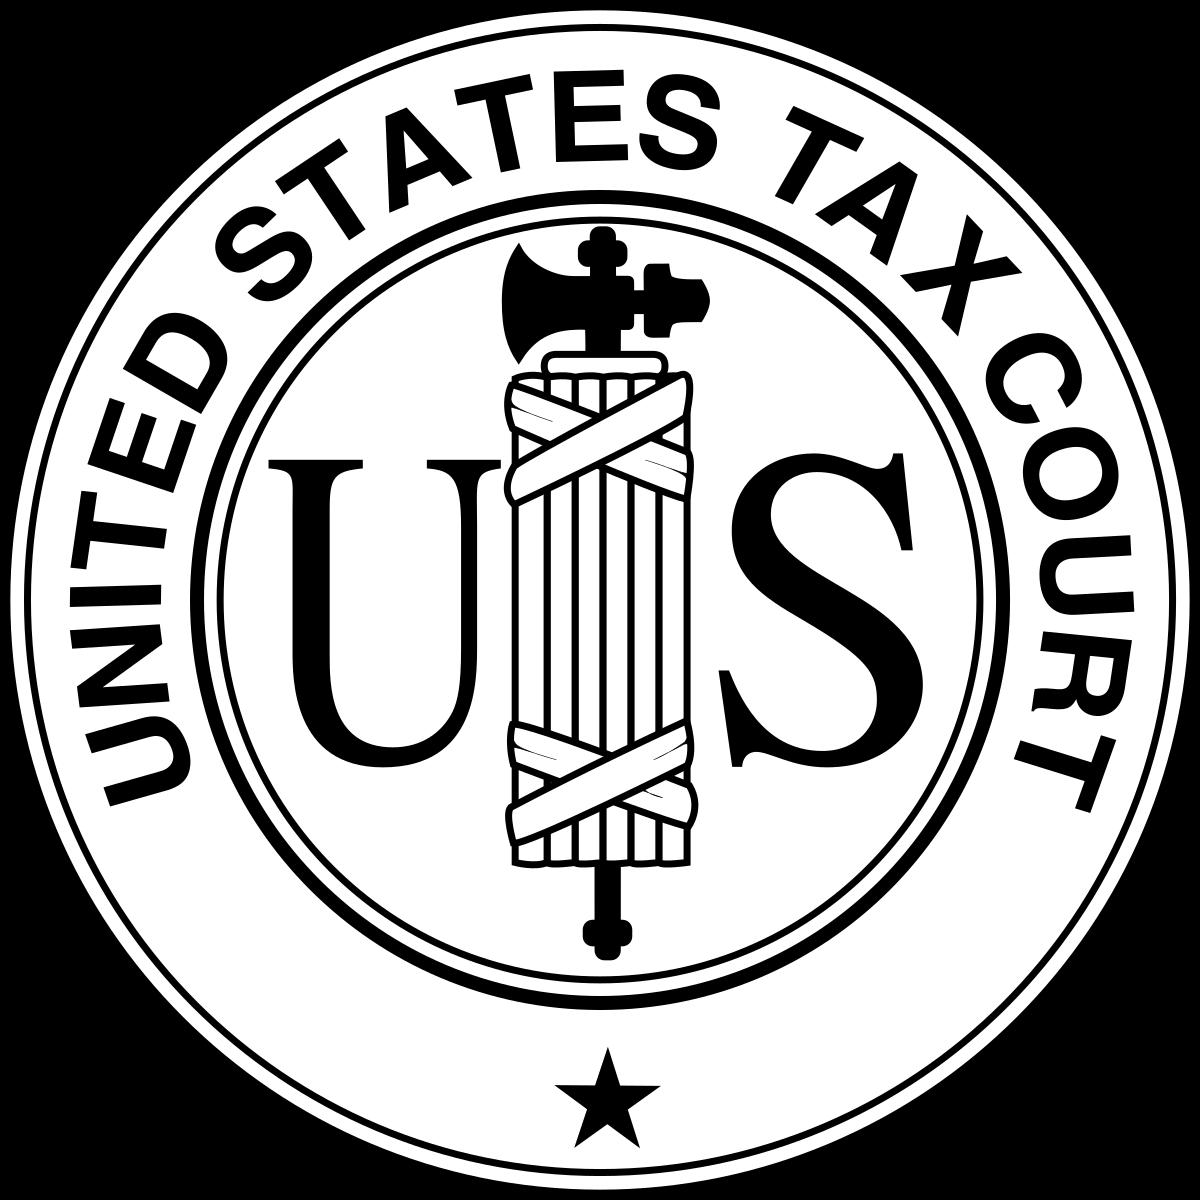 1200x1200 United States Tax Court